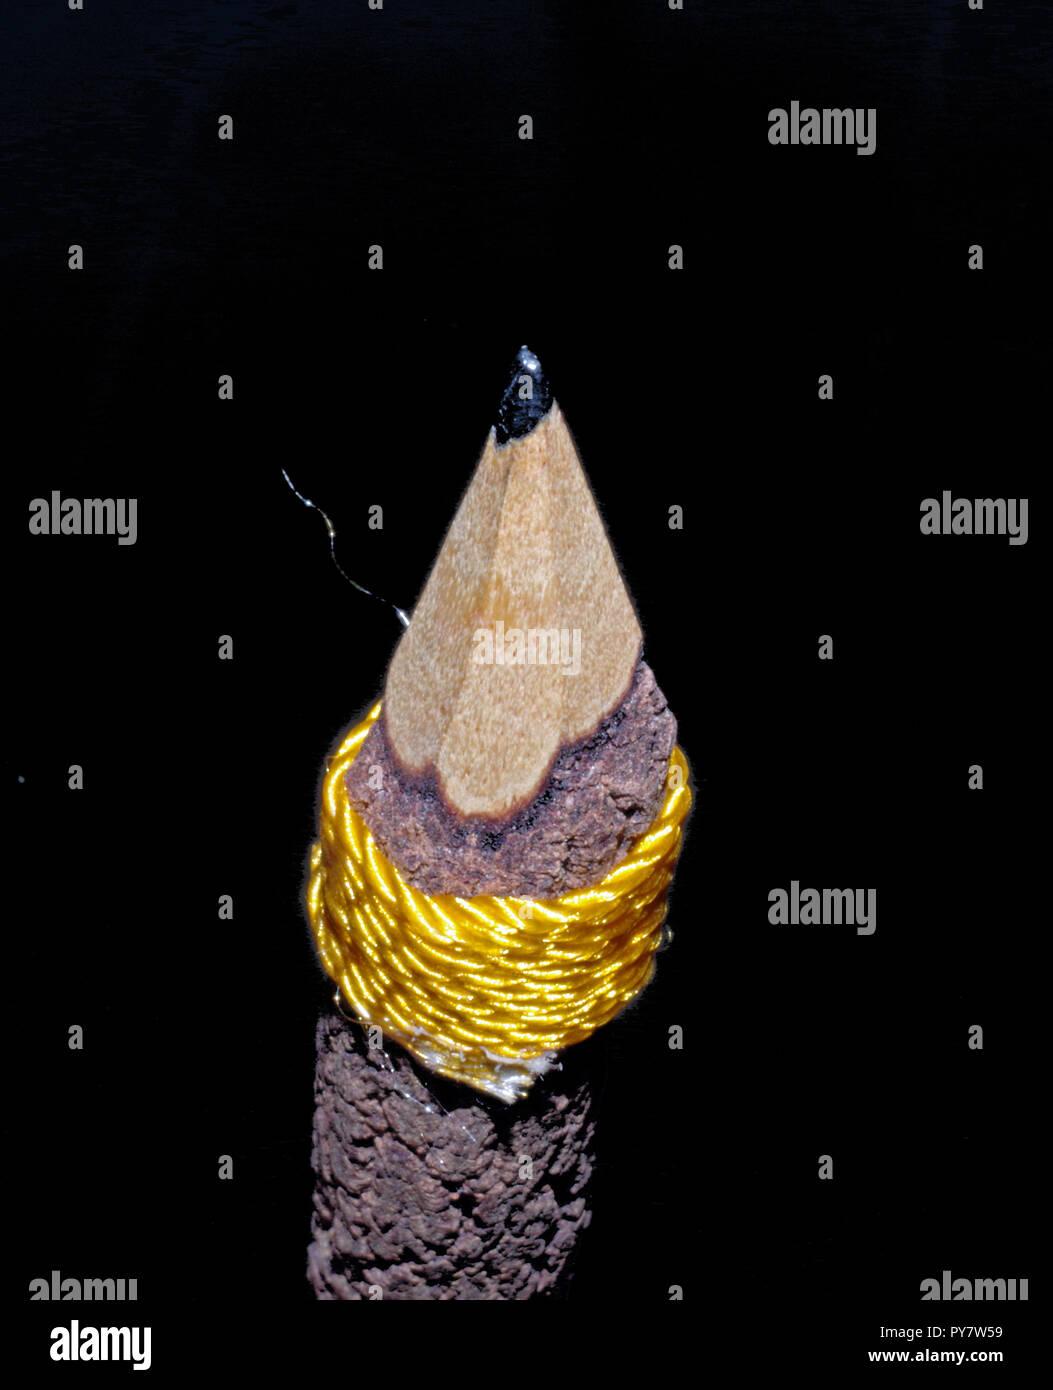 Holz- Bleistift close-up Stockbild